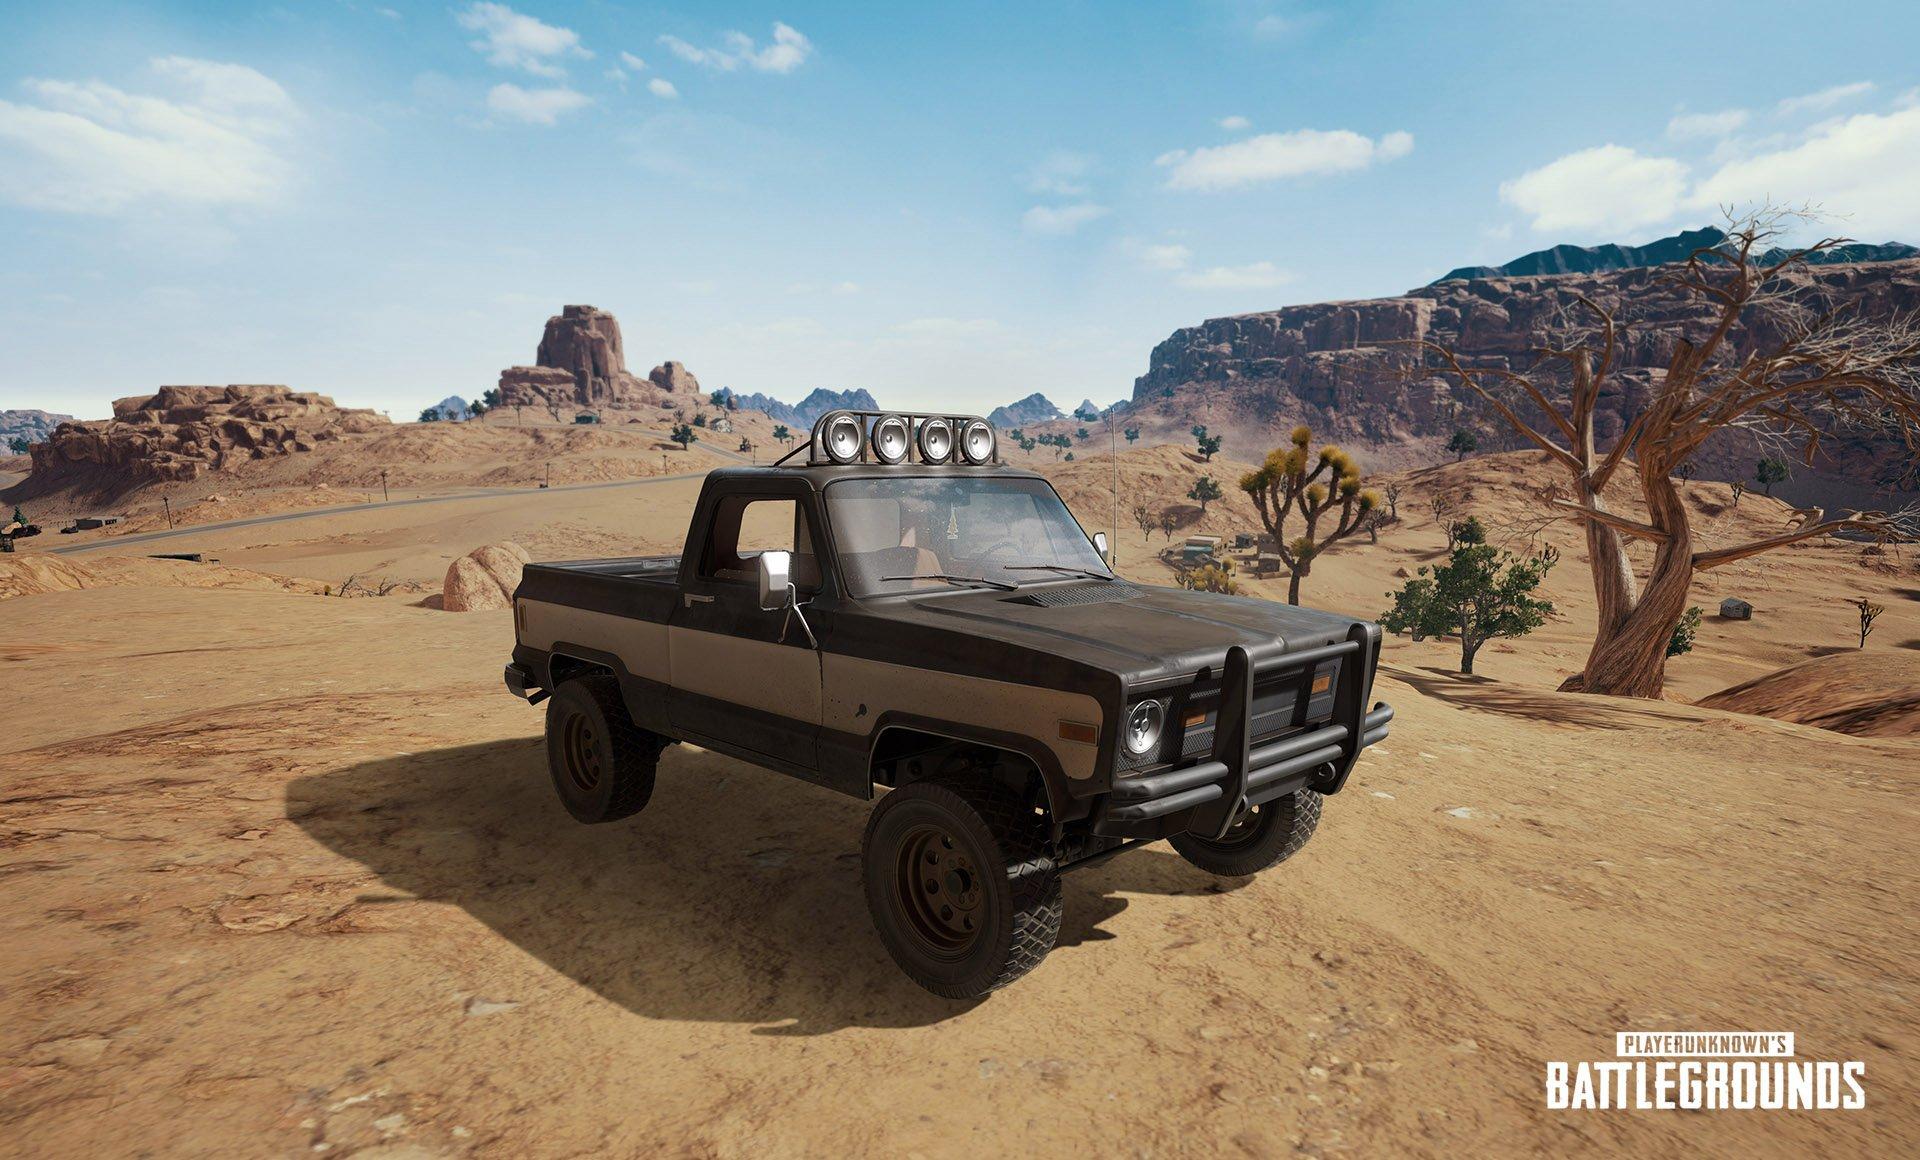 Pubg Buggy Wallpaper: PUBG Desert Map Miramar Gets New R45 Revolver To Replace